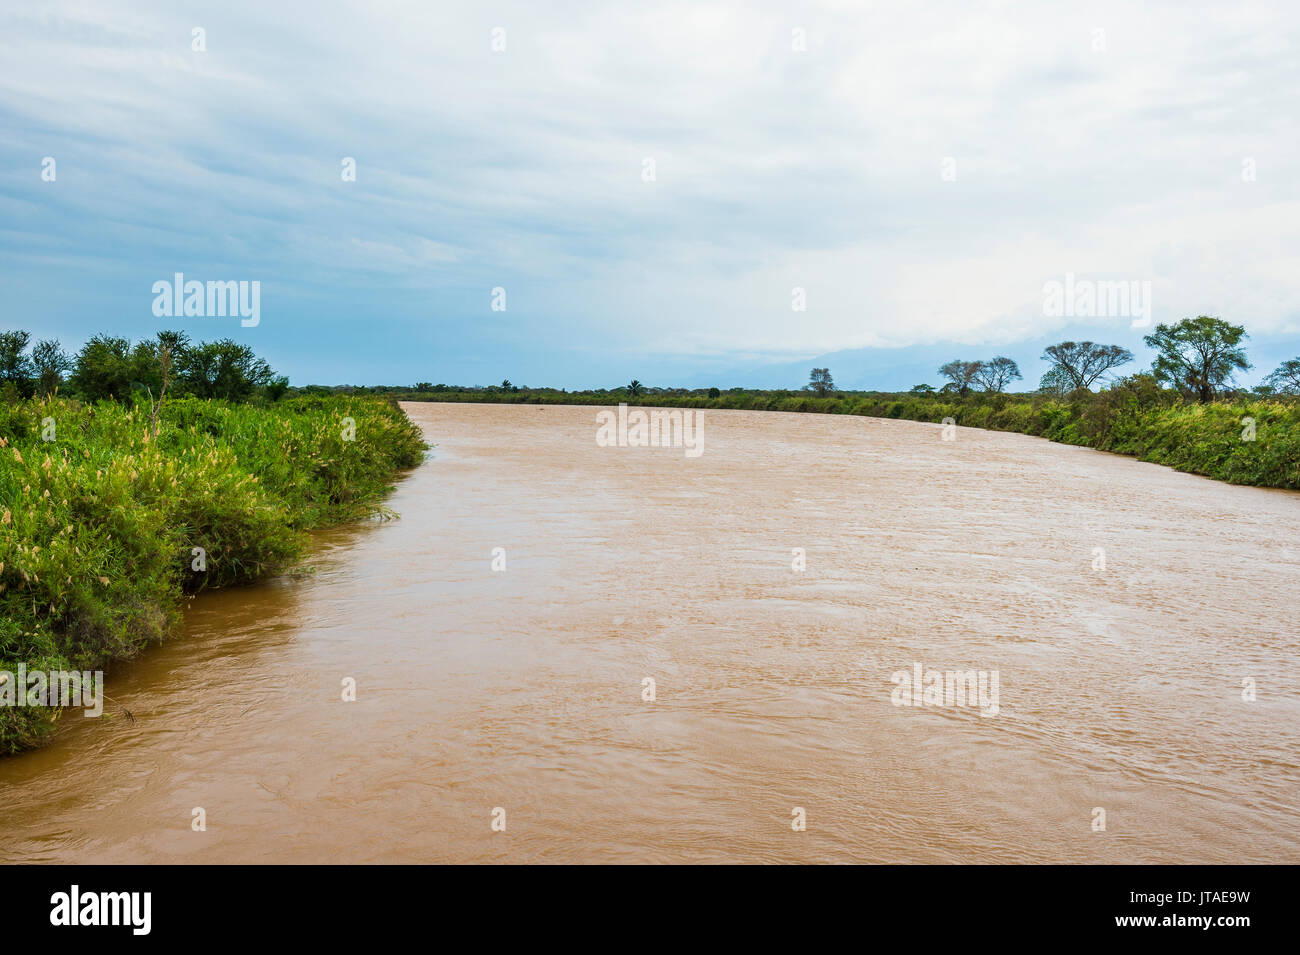 Rusizi River flowing in Lake Tanganyika, Bujumbura, Burundi, Africa - Stock Image